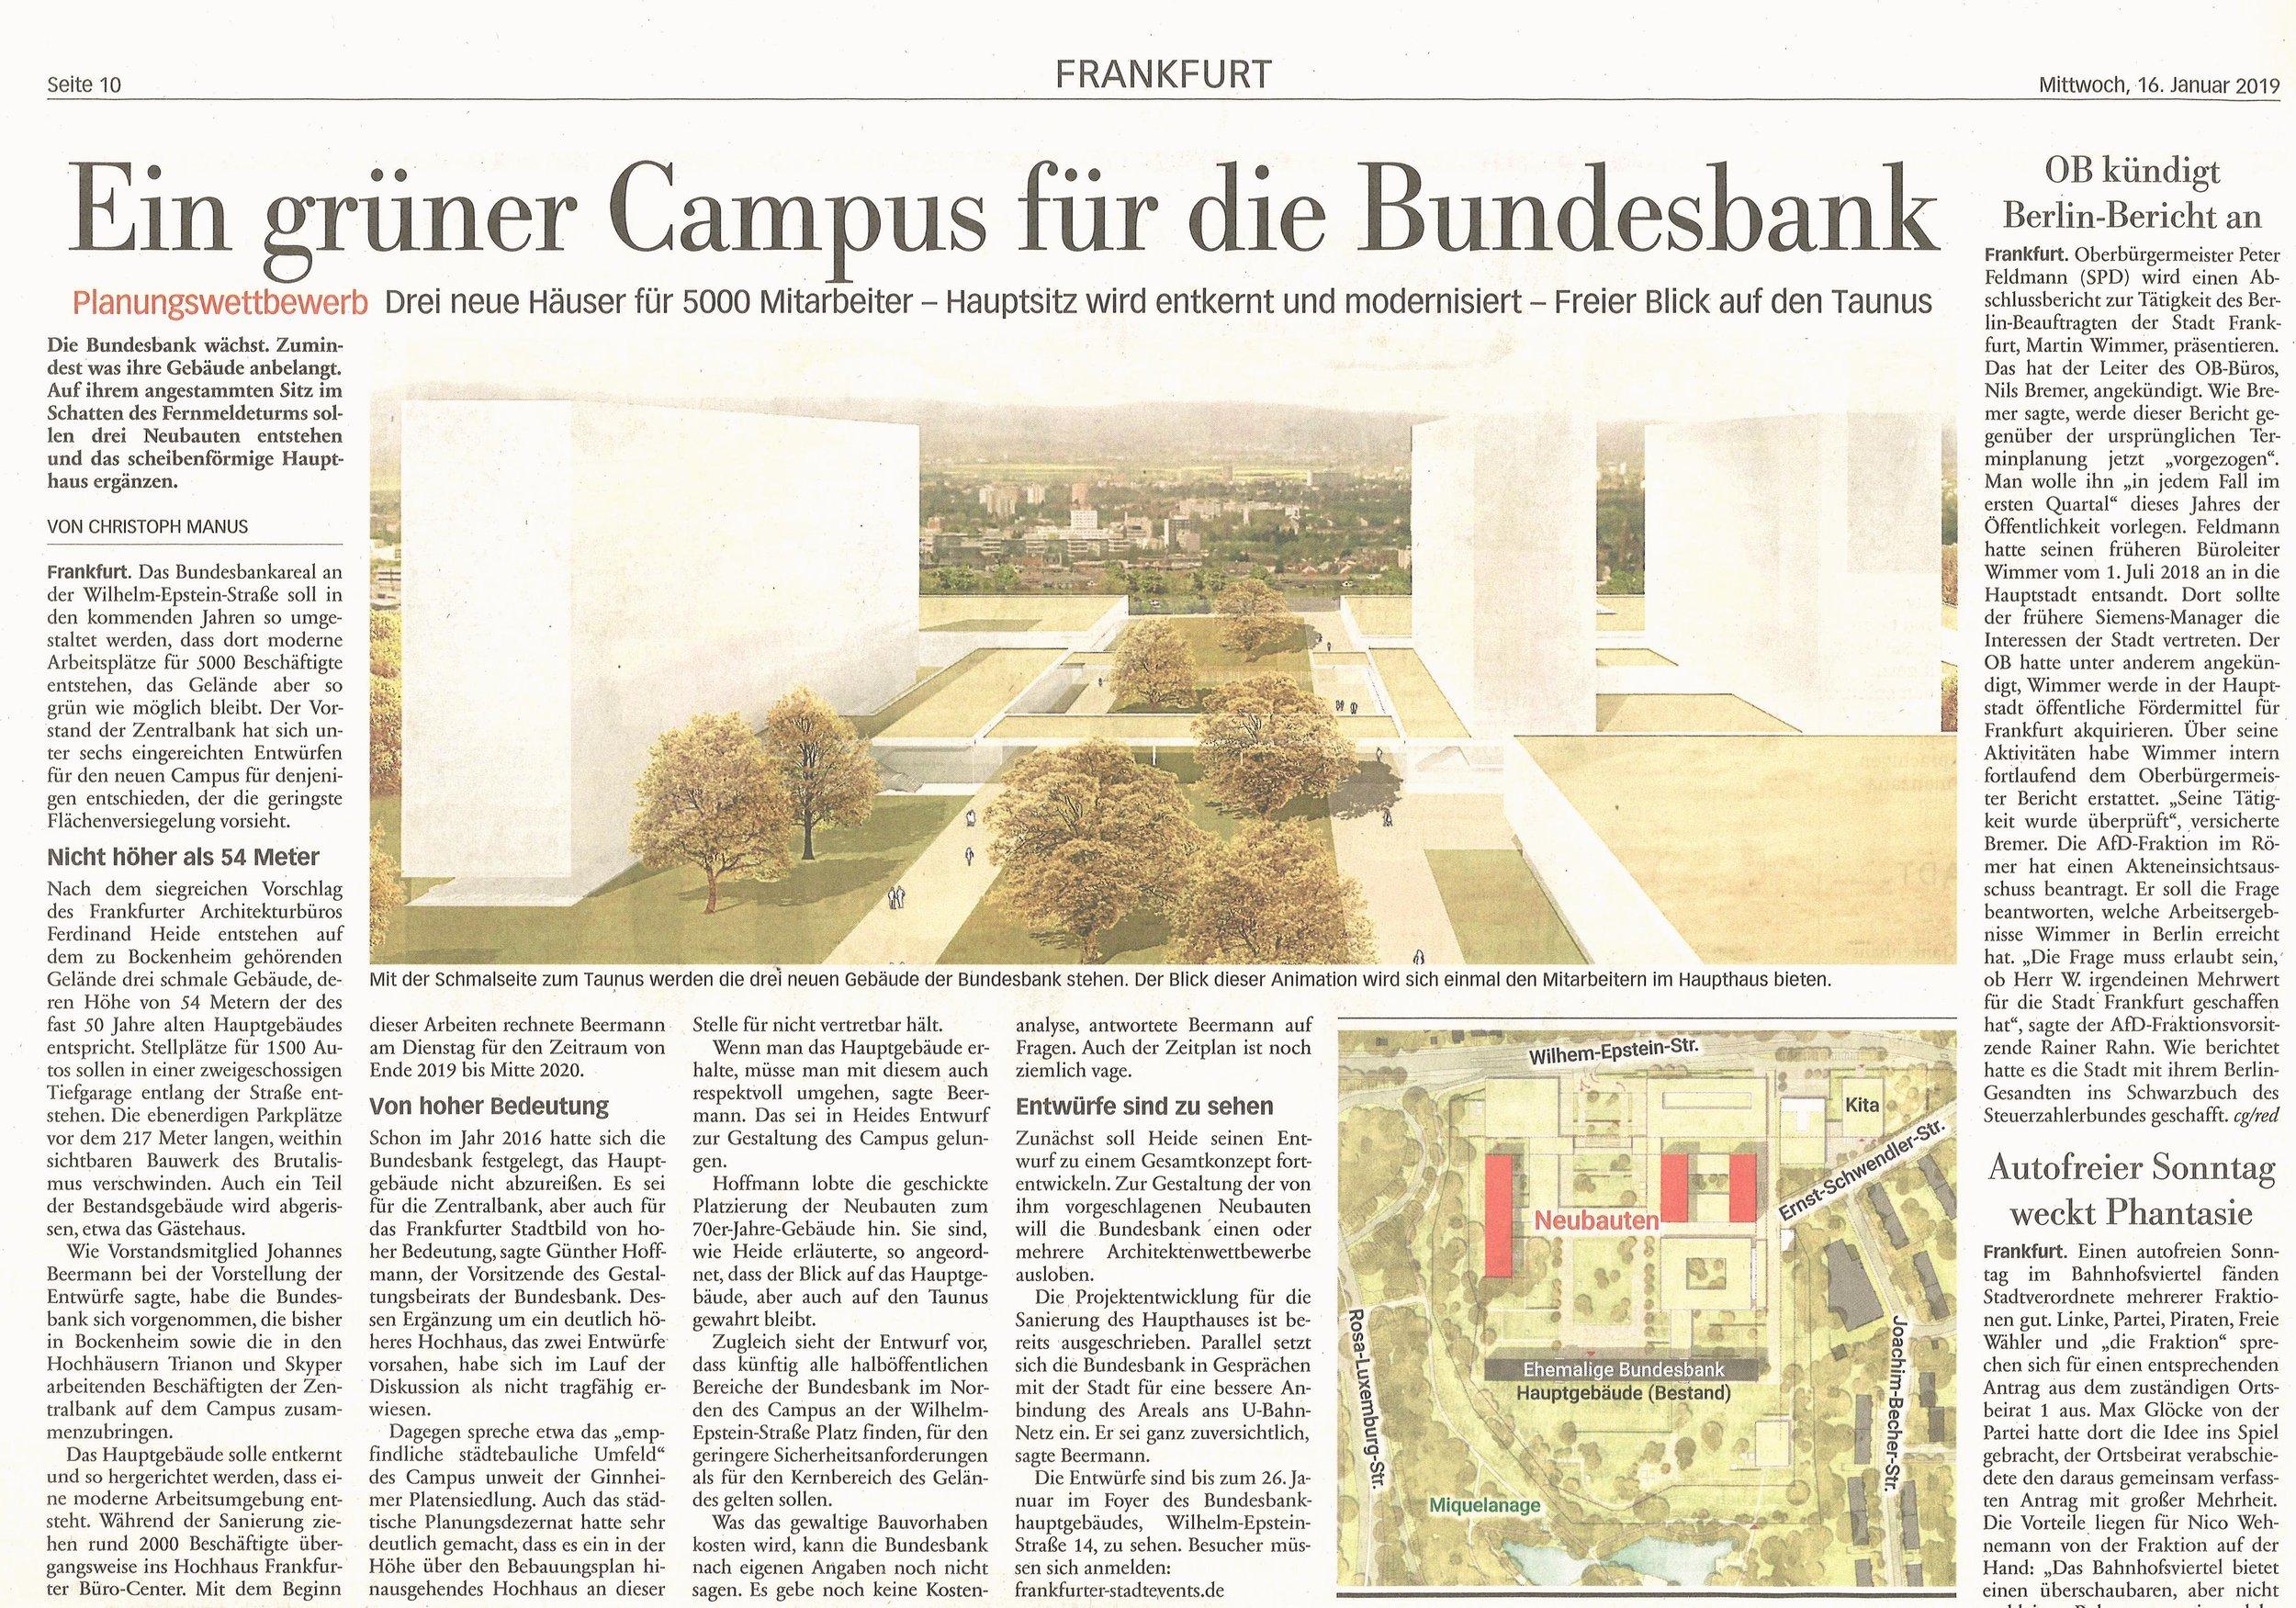 190116_Frankfurt_Bundesbank_1.jpg